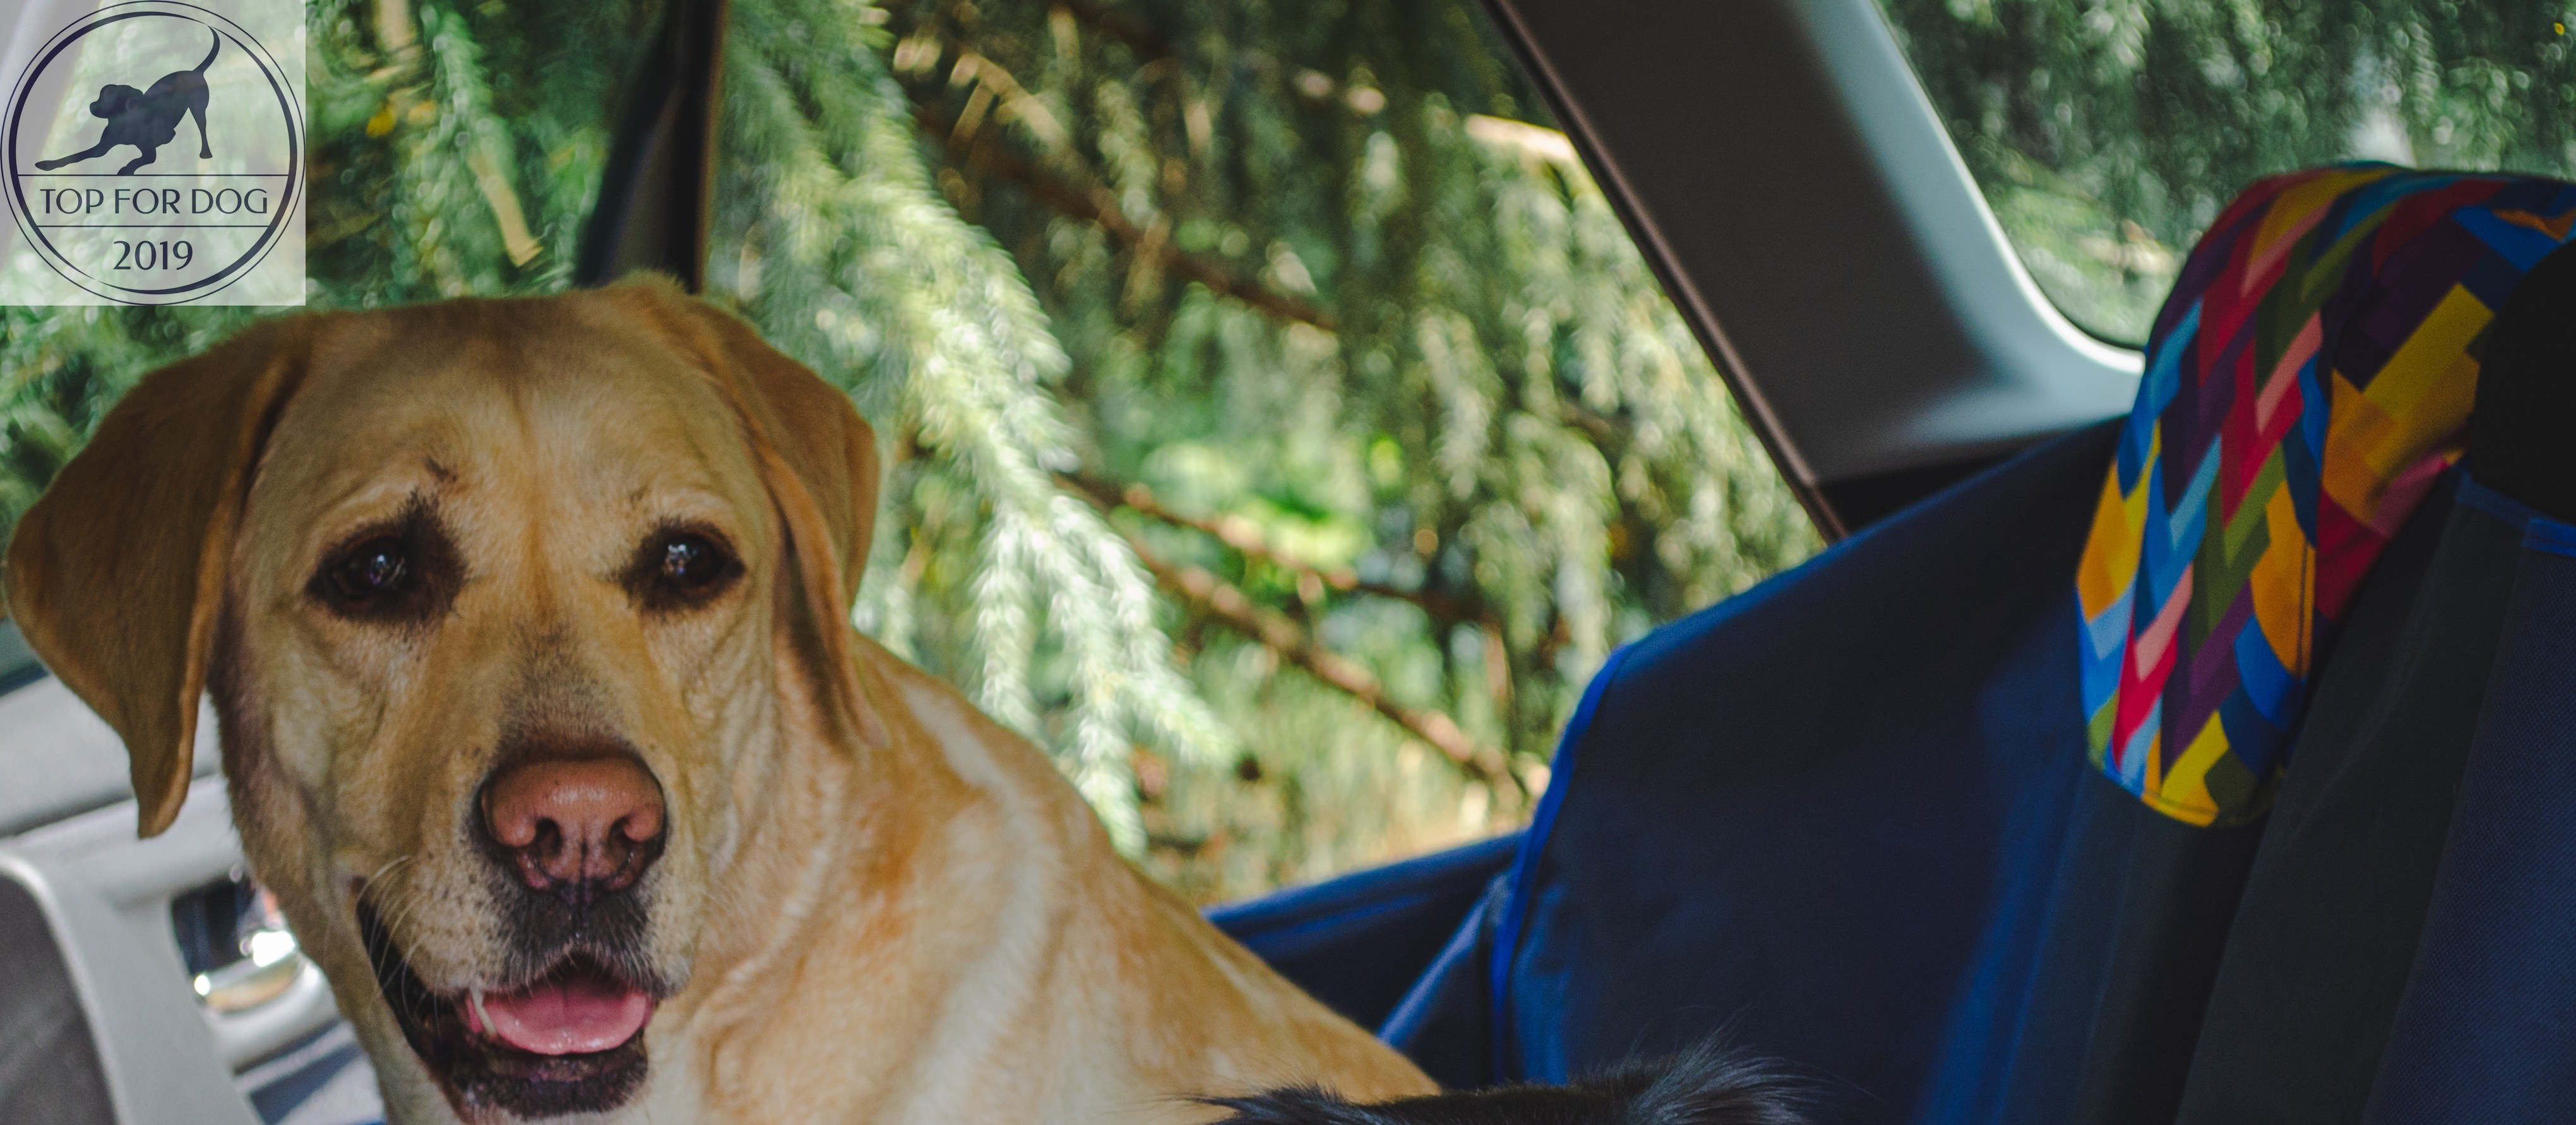 BeBobi mata samochodowa KUKO+ – recenzja dla Top for Dog